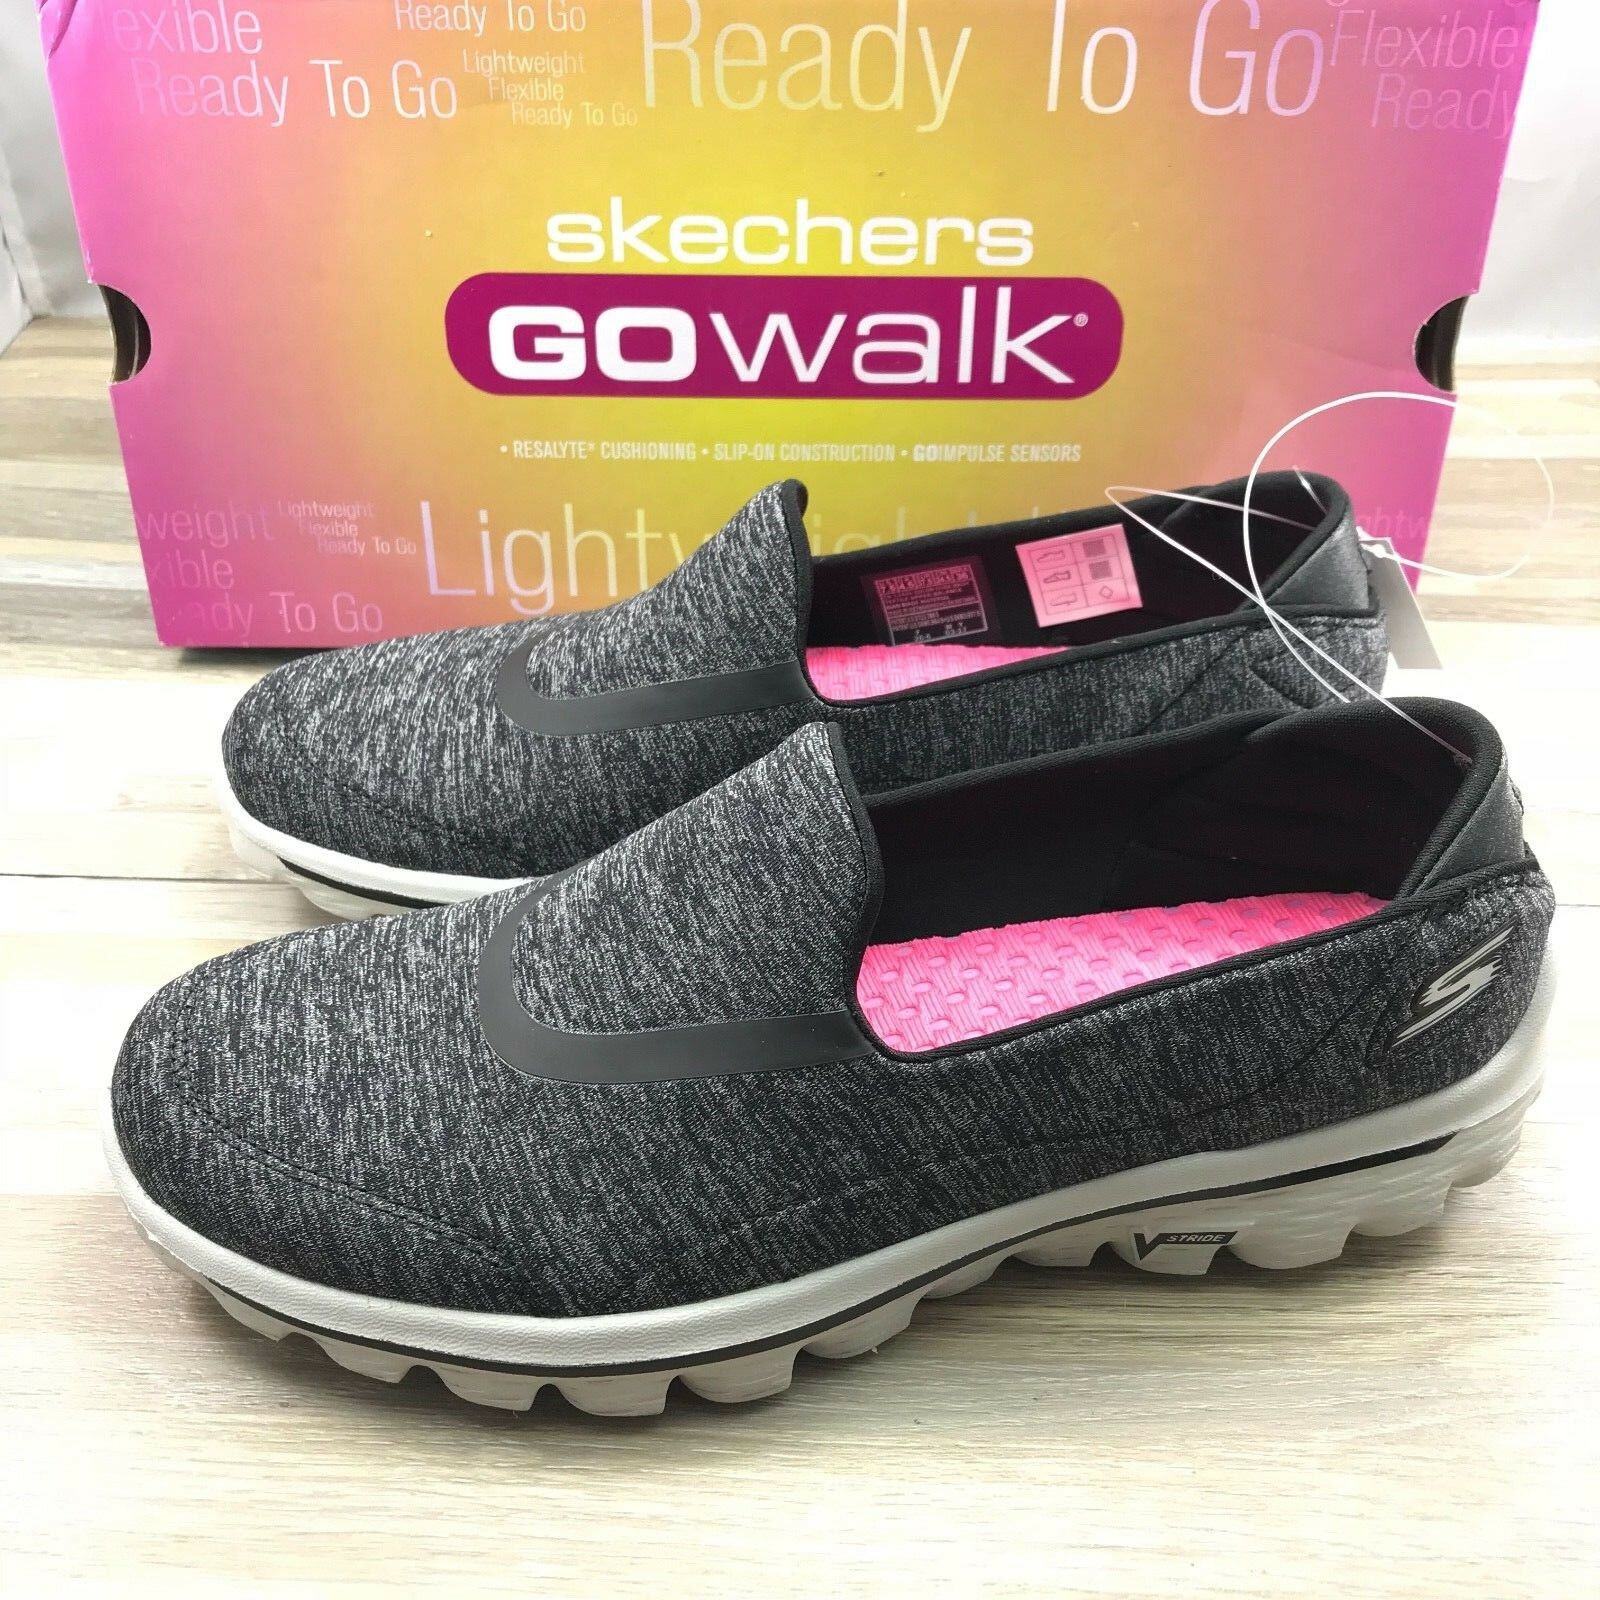 Walking Shoe 13753 SIL Size 7.5